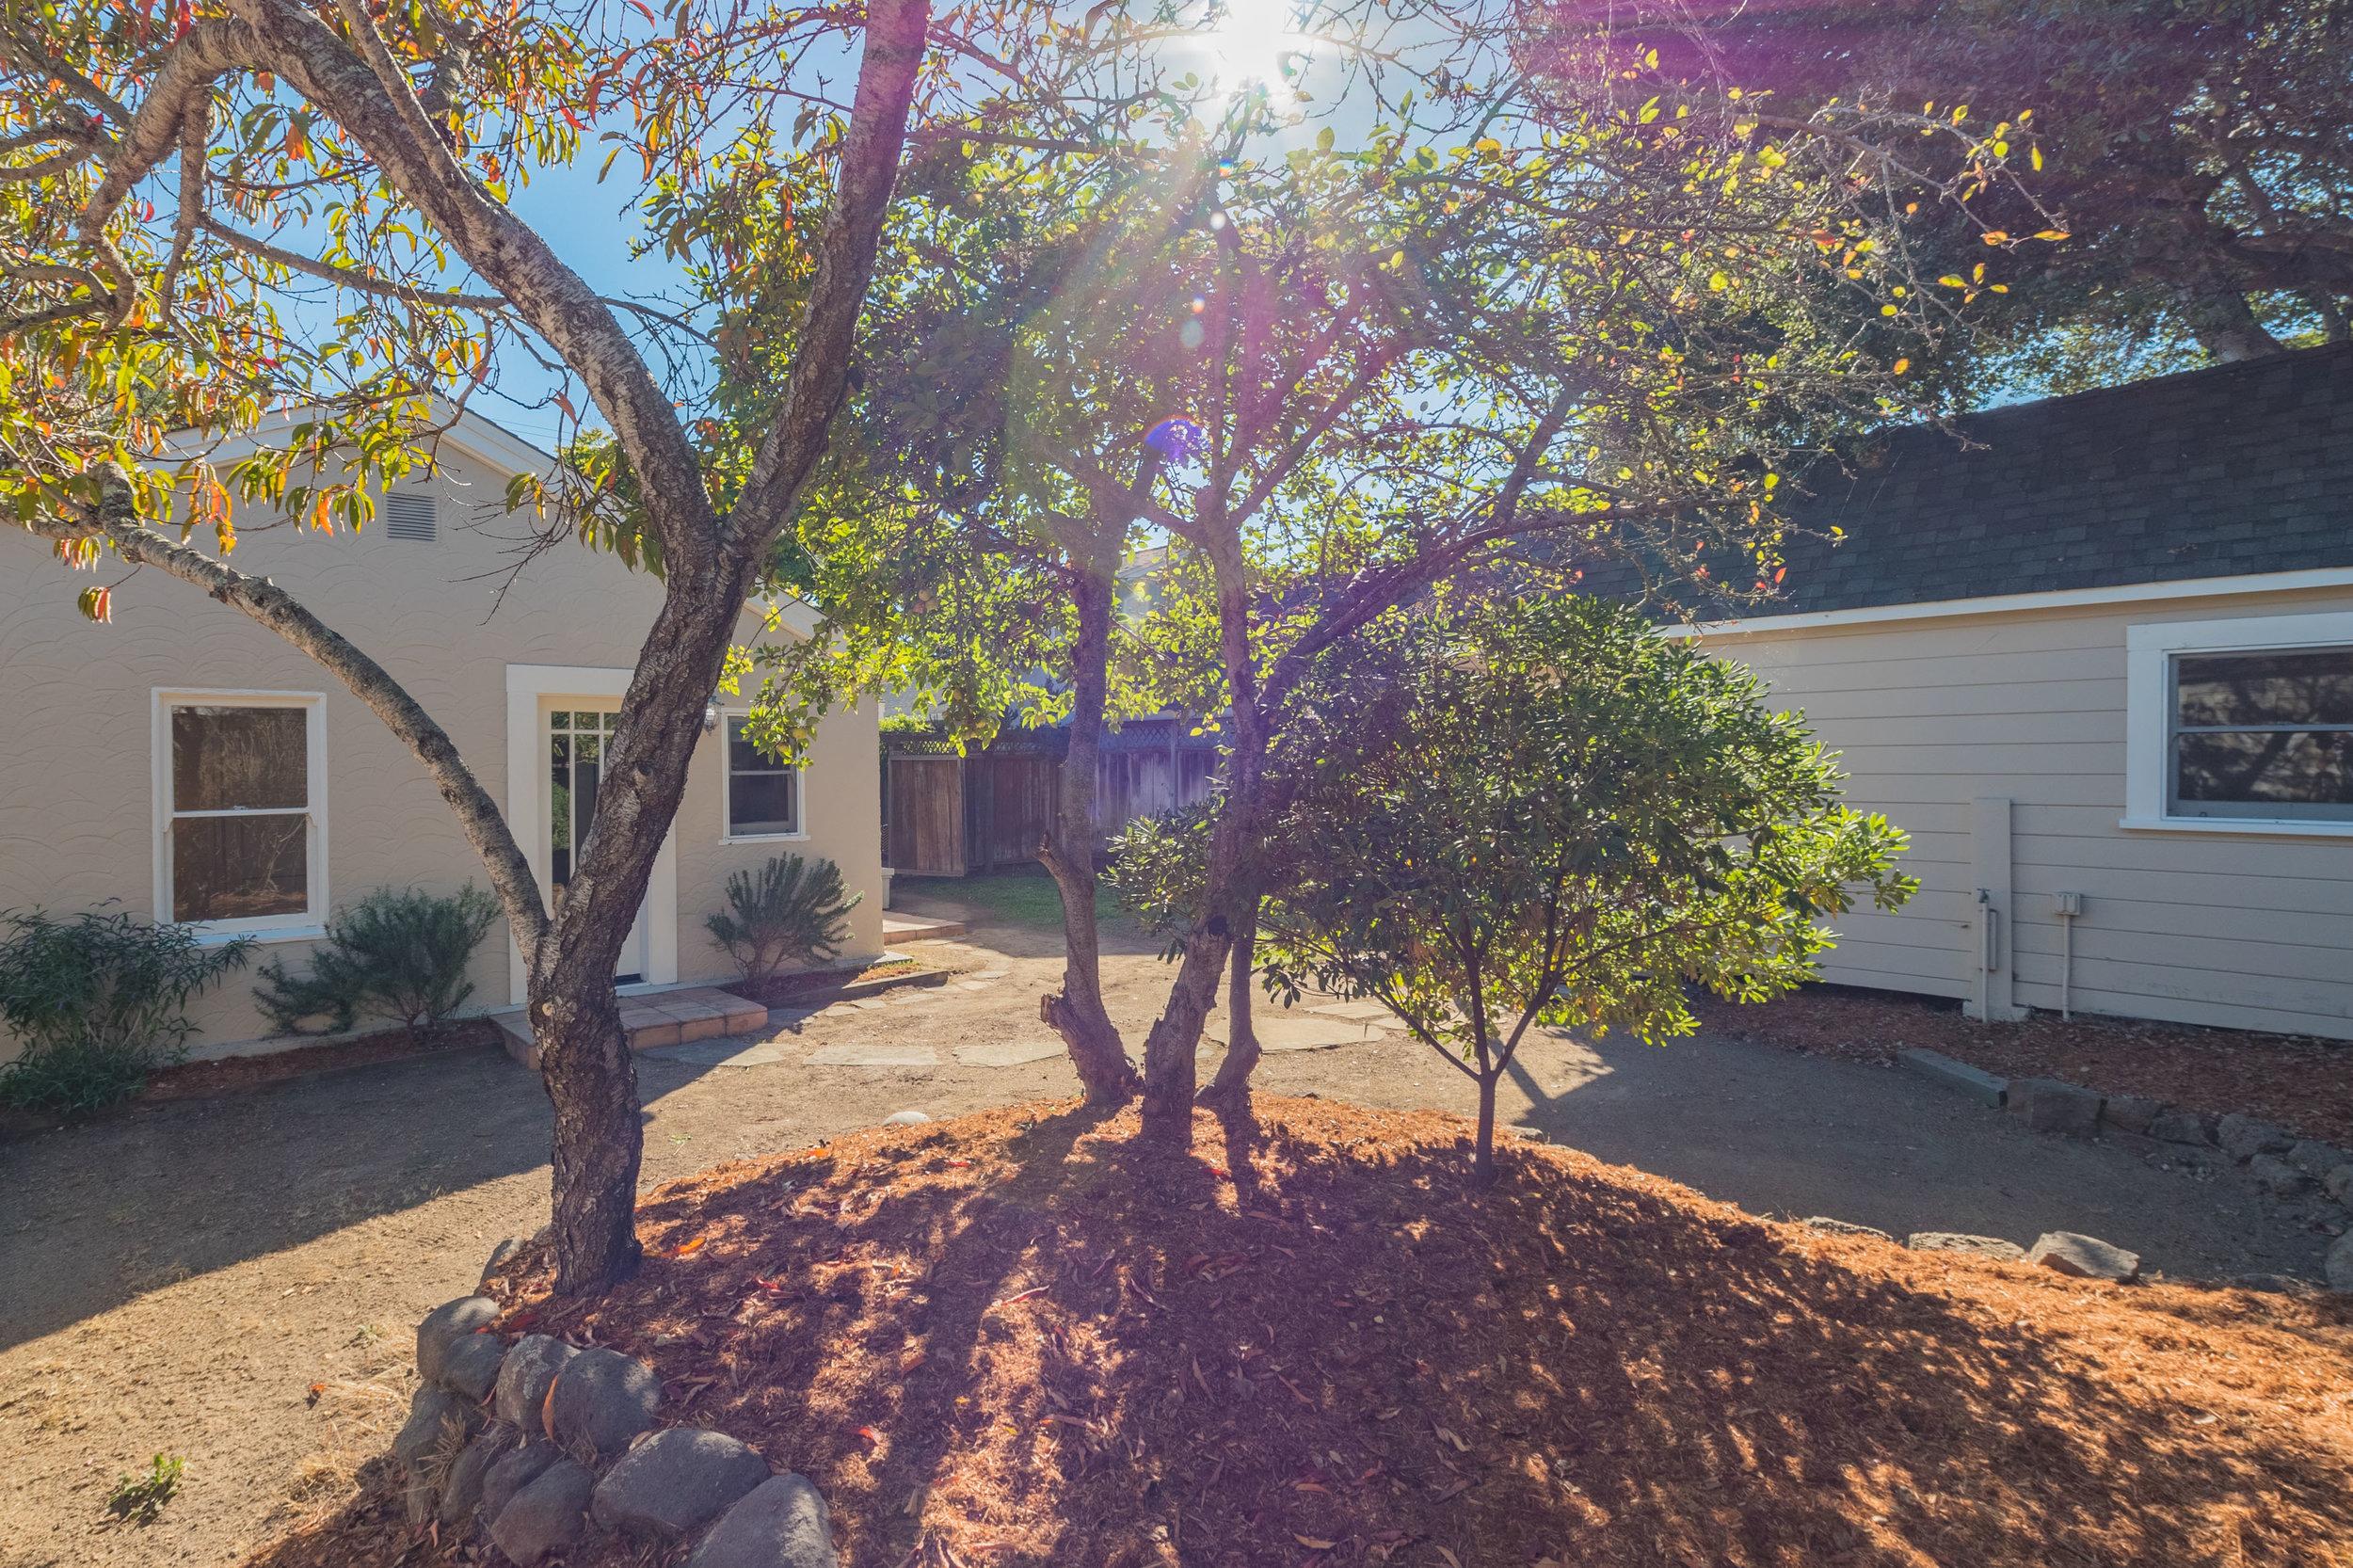 Single Family Home + ADU Santa Cruz, California